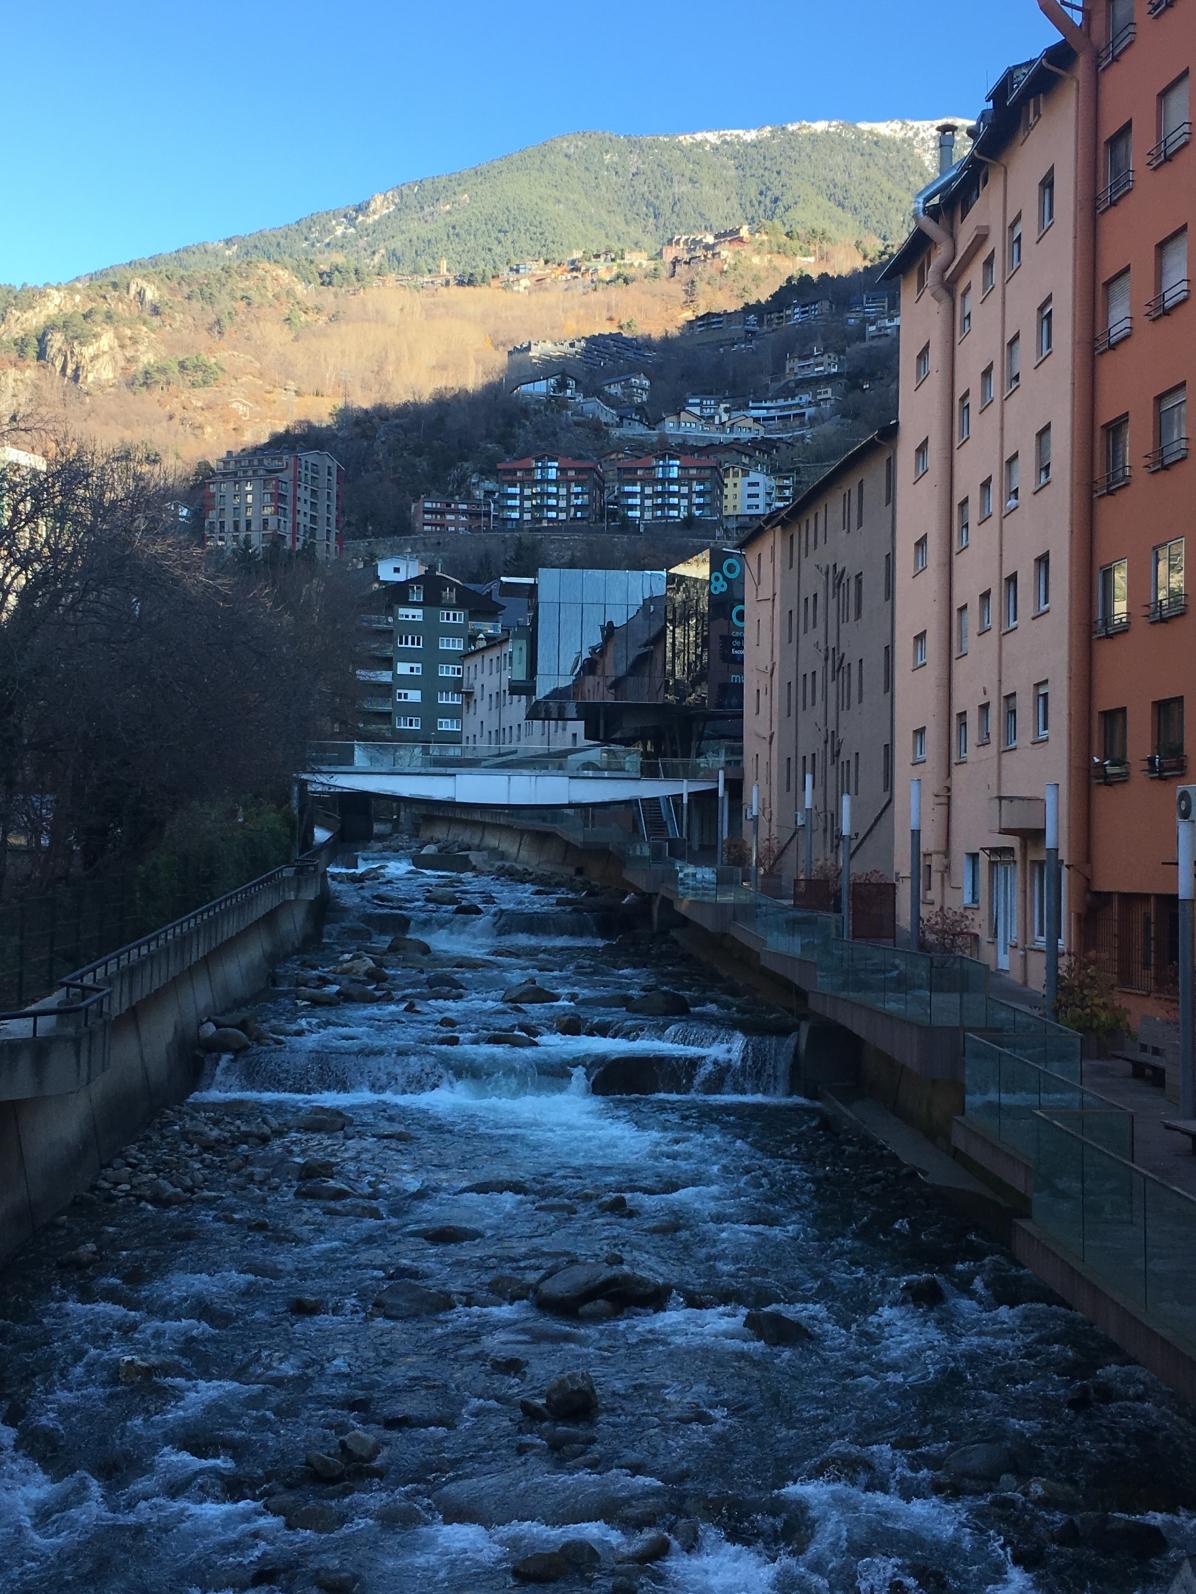 Andorra buildings with stream